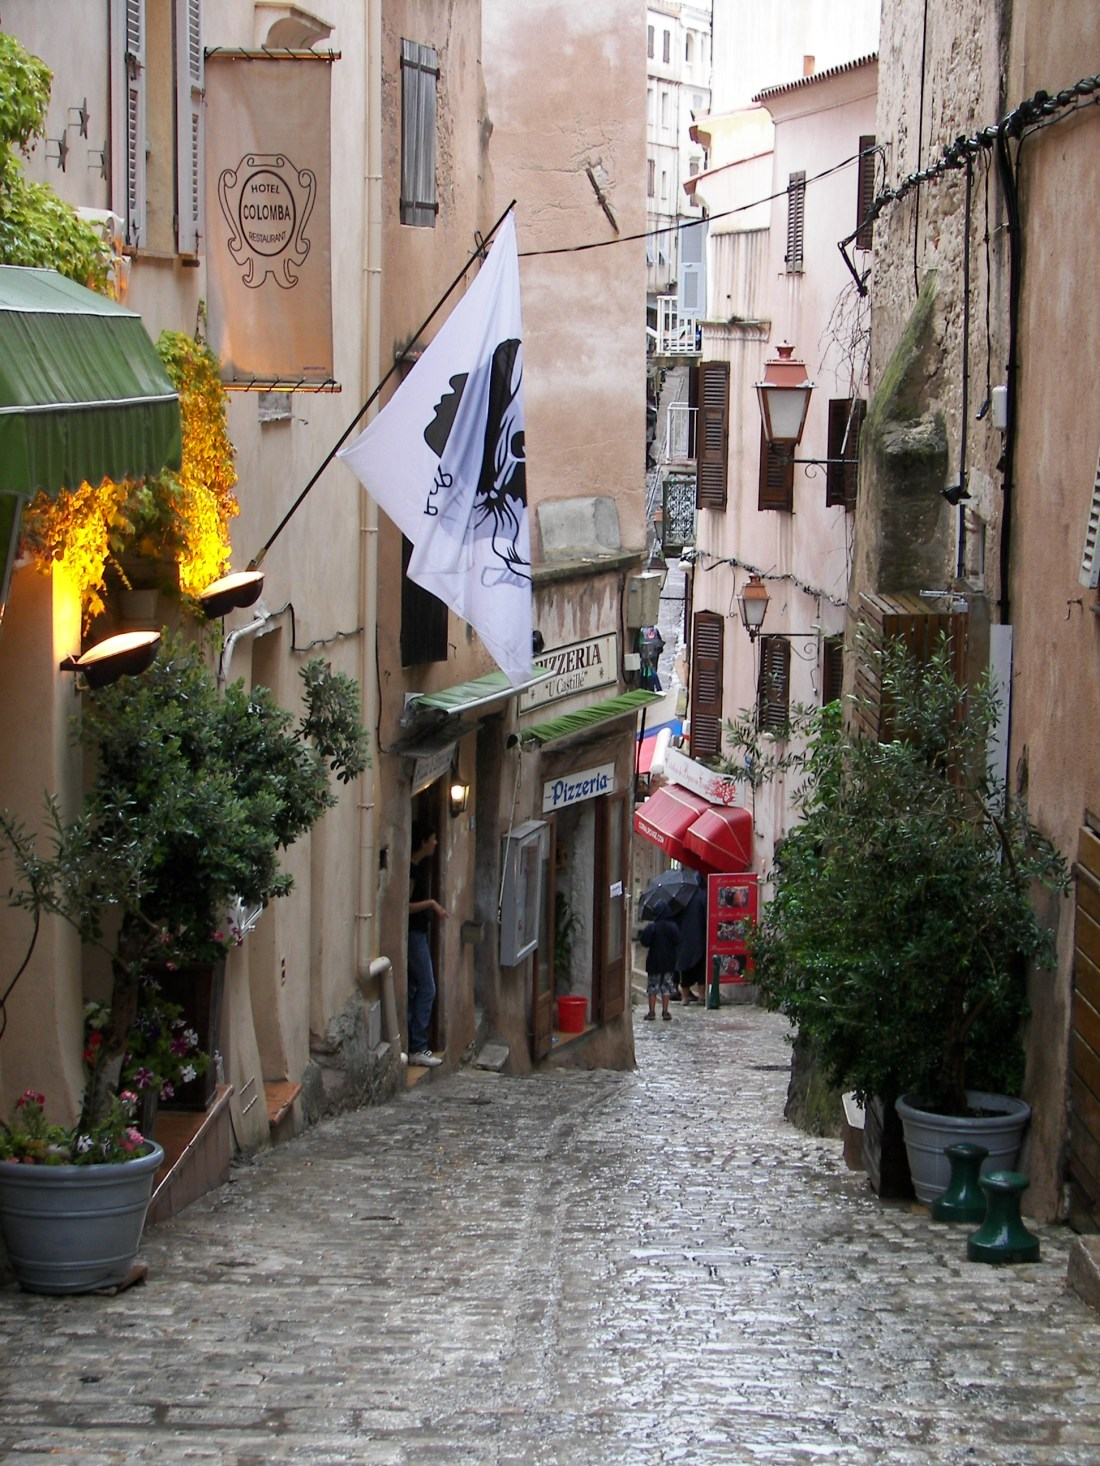 Vacances 2011 - Corse 237